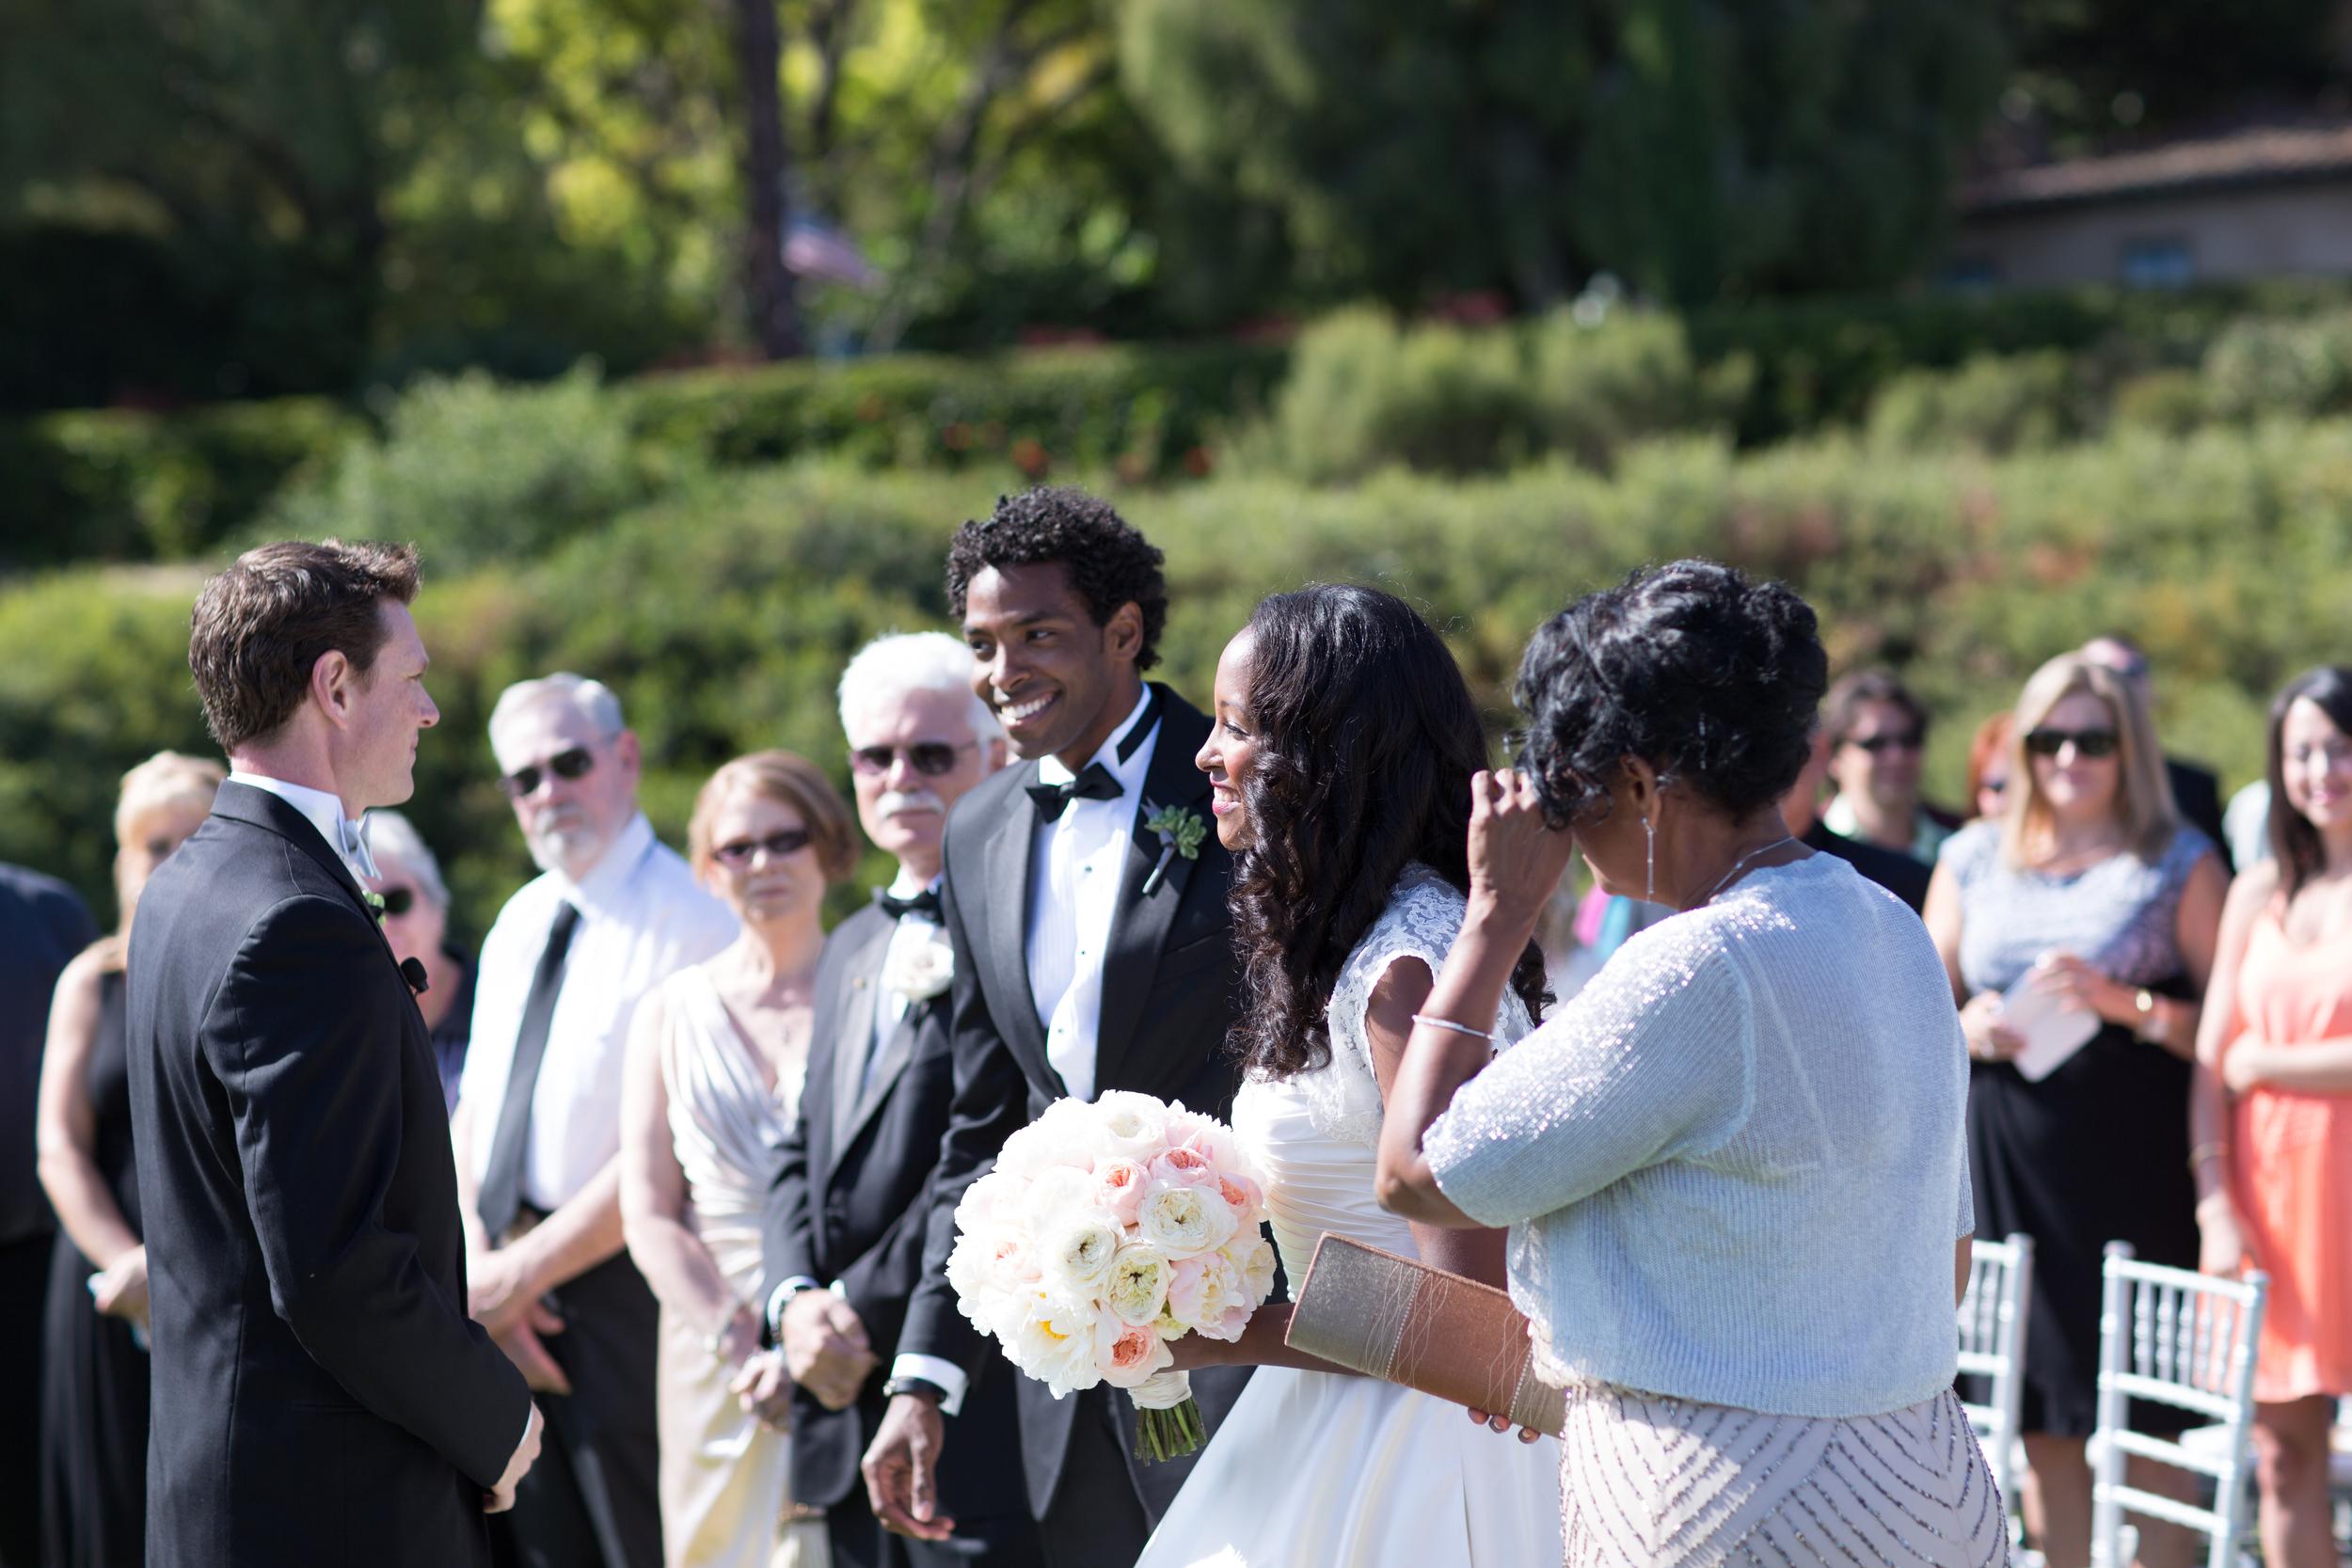 Santa Barbara Wedding Officiant Miriam Lindbeck | Non-Denominational Minister Serving Southern California